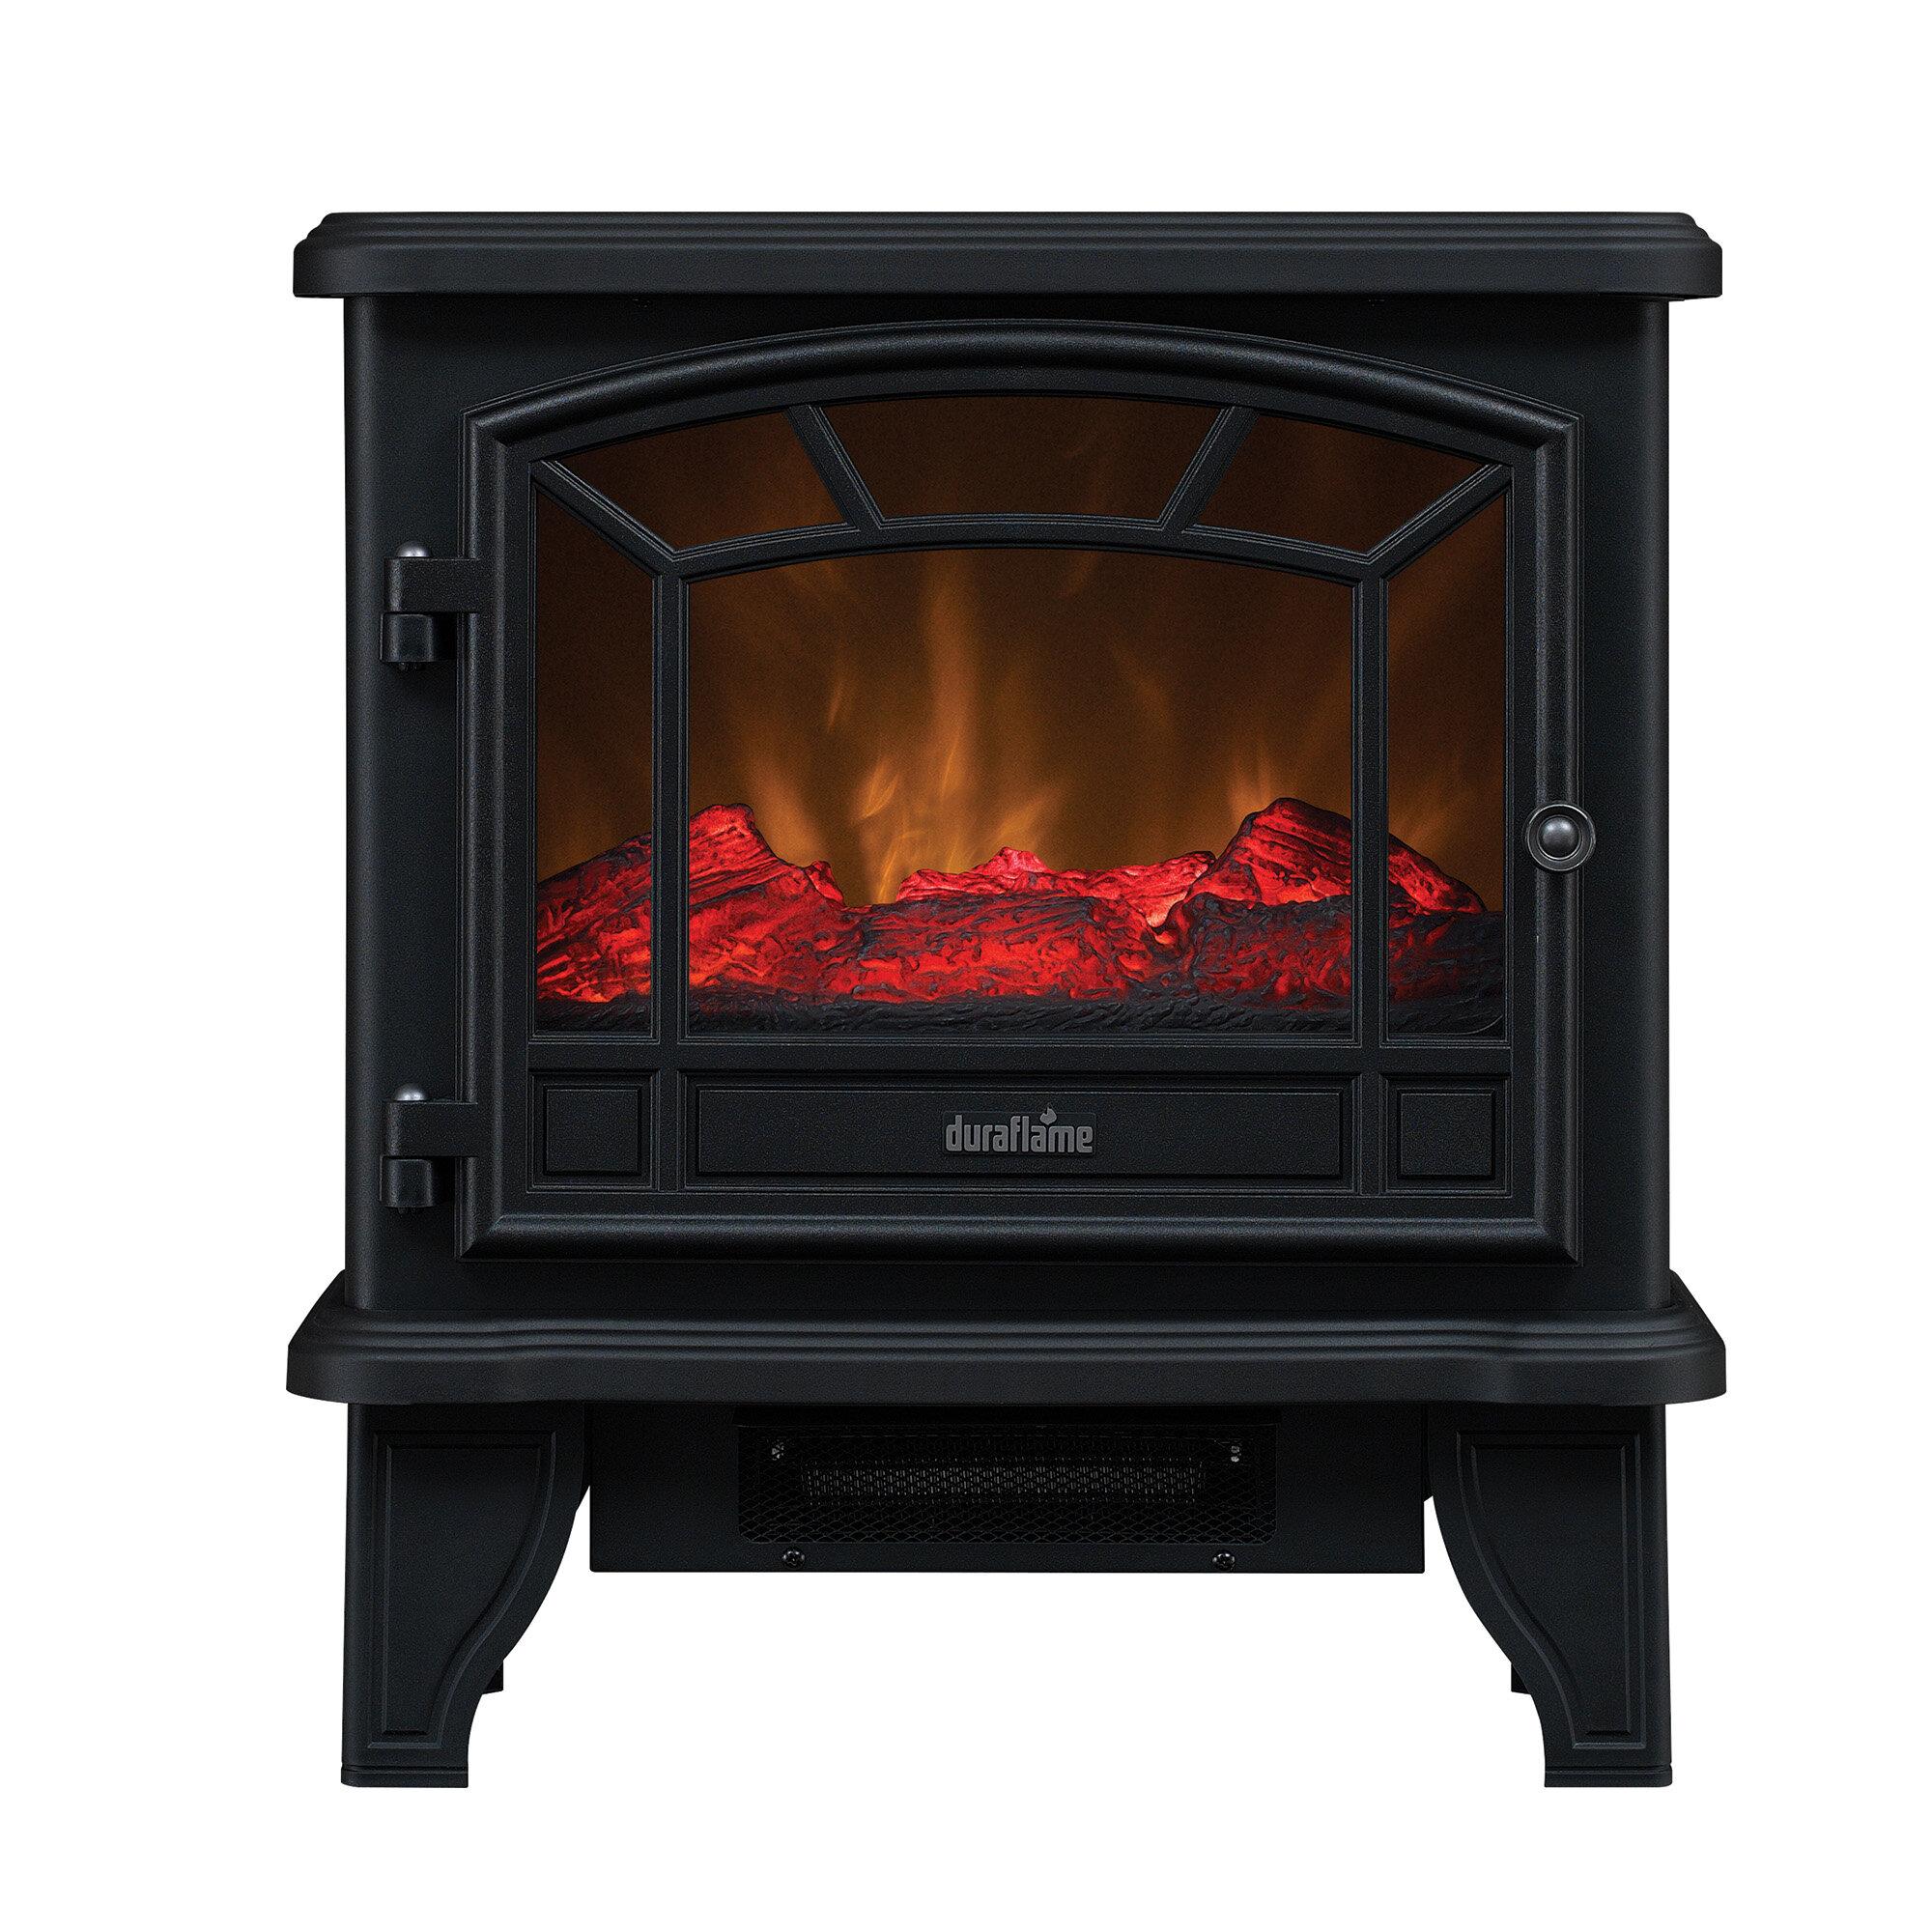 electric potbelly stoves wayfair rh wayfair com Pot Belly Stove Heating Looking Electric Heater Pot Belly